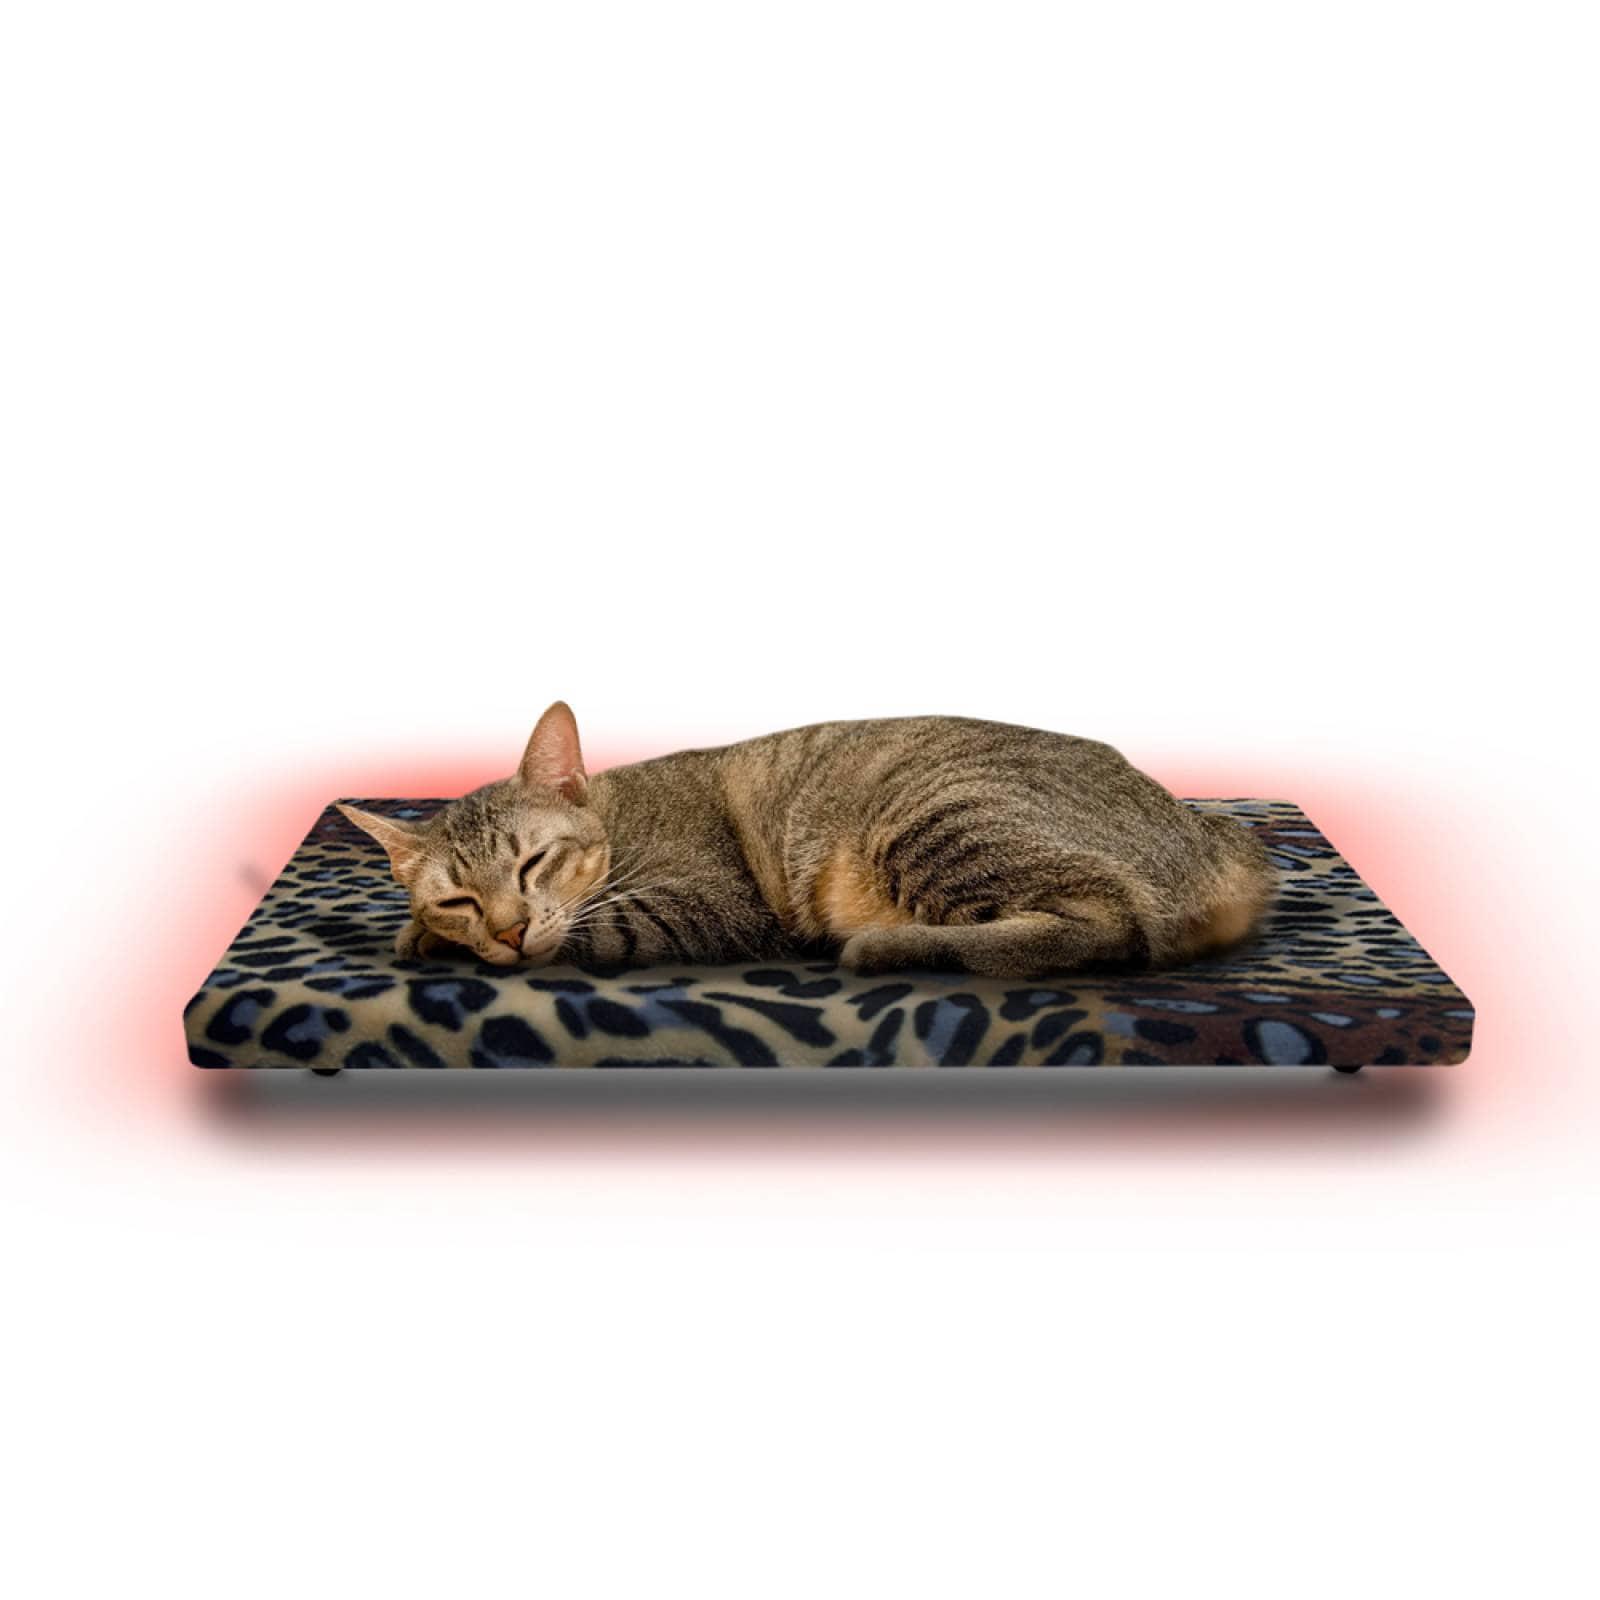 Cama Calefaccionada para Gatos y Mascotas, Pet Wave Pet Lover Jaguar de 32/48ºC 38/76W 50x40cm, Mod: 2CSPLJa